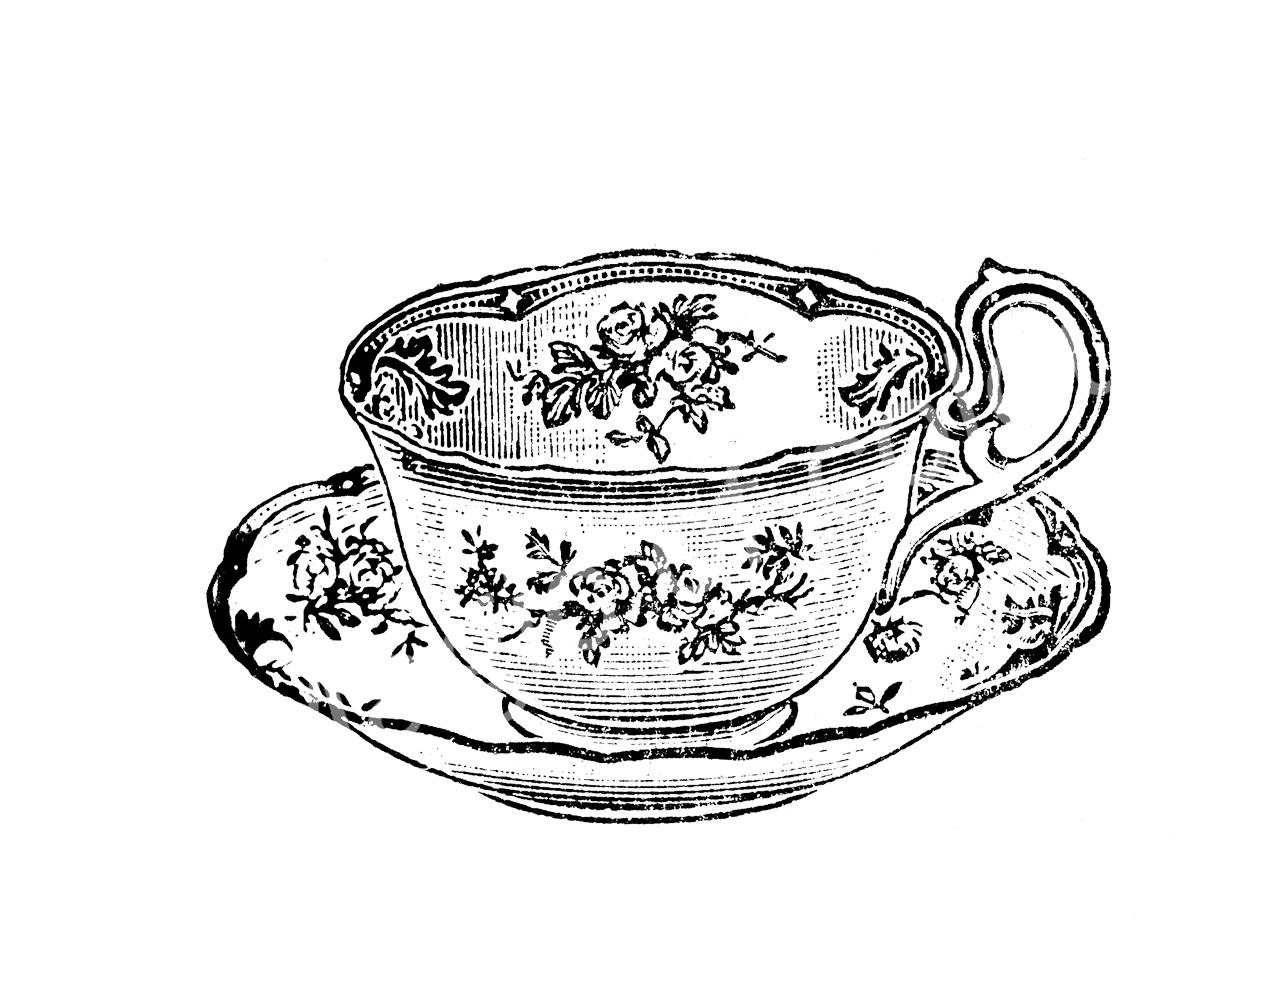 Drawn tea cup Sketch In a wonderland In